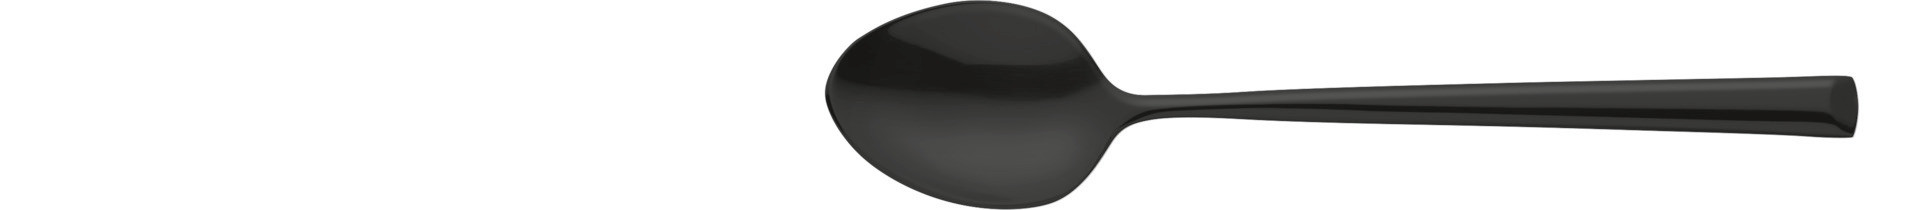 Metropole PVD, Kaffeelöffel 138 mm PVD schwarz